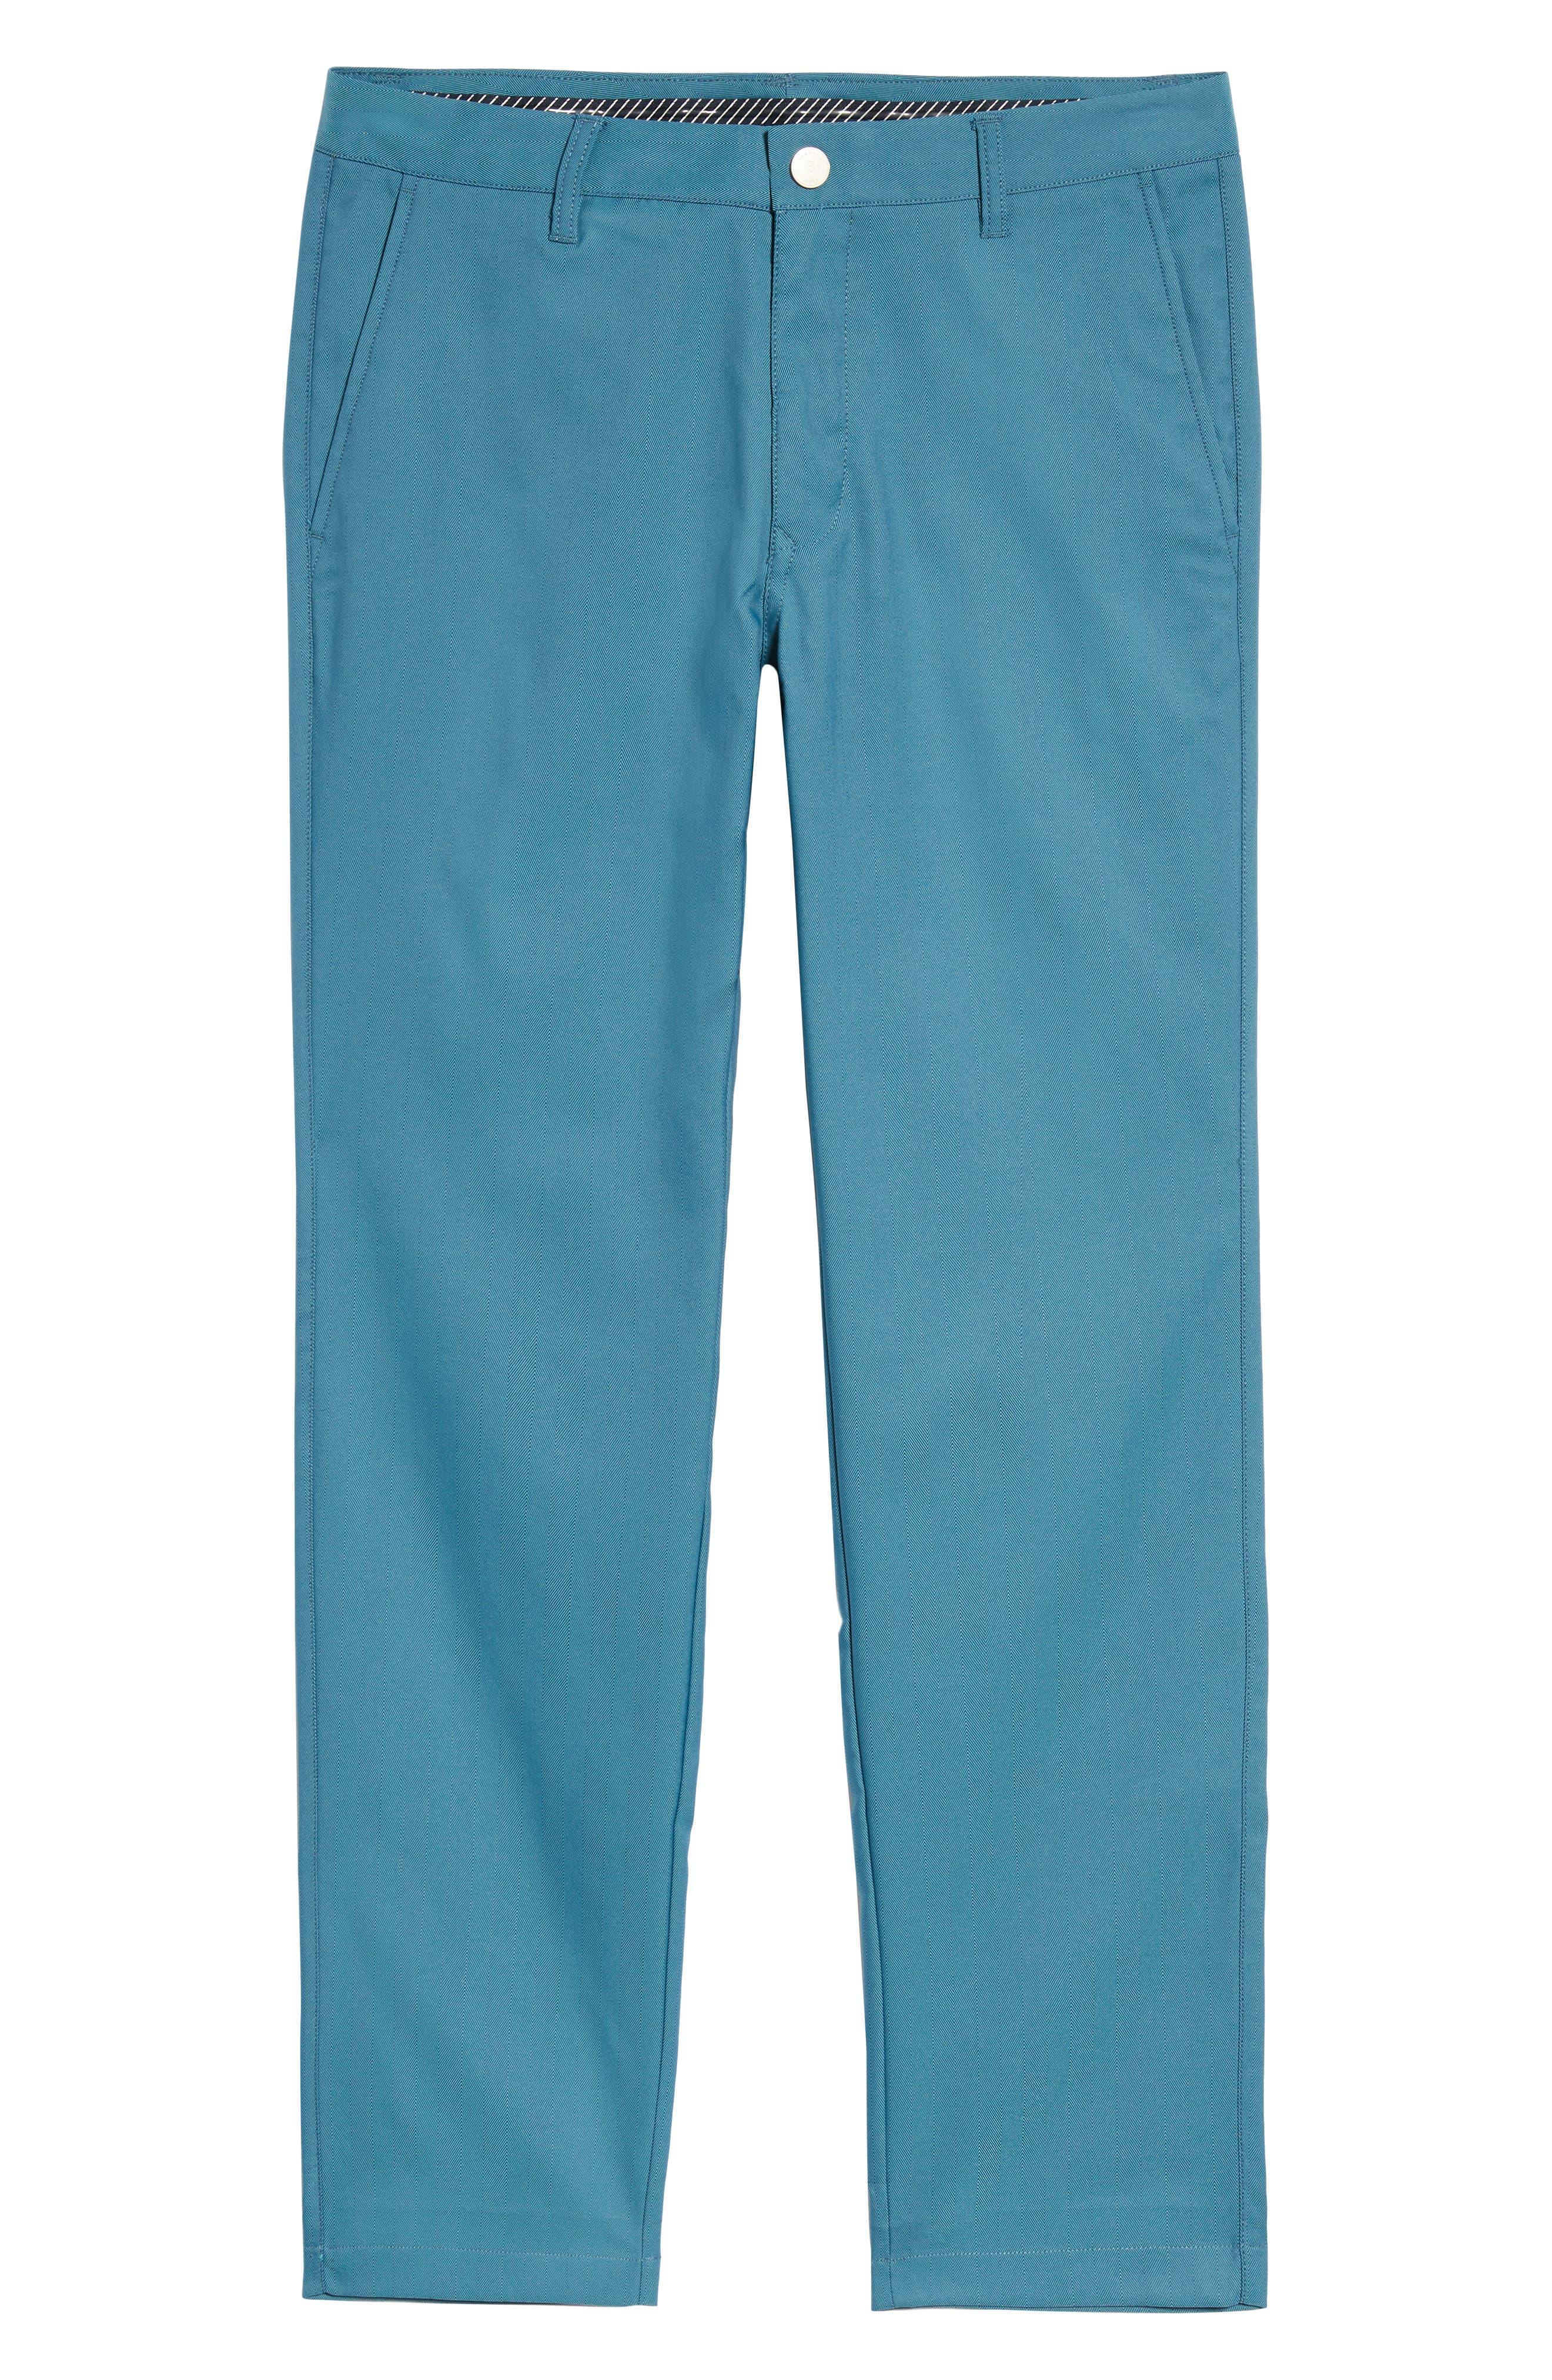 Highland Slim Fit Golf Pants,                             Alternate thumbnail 6, color,                             400